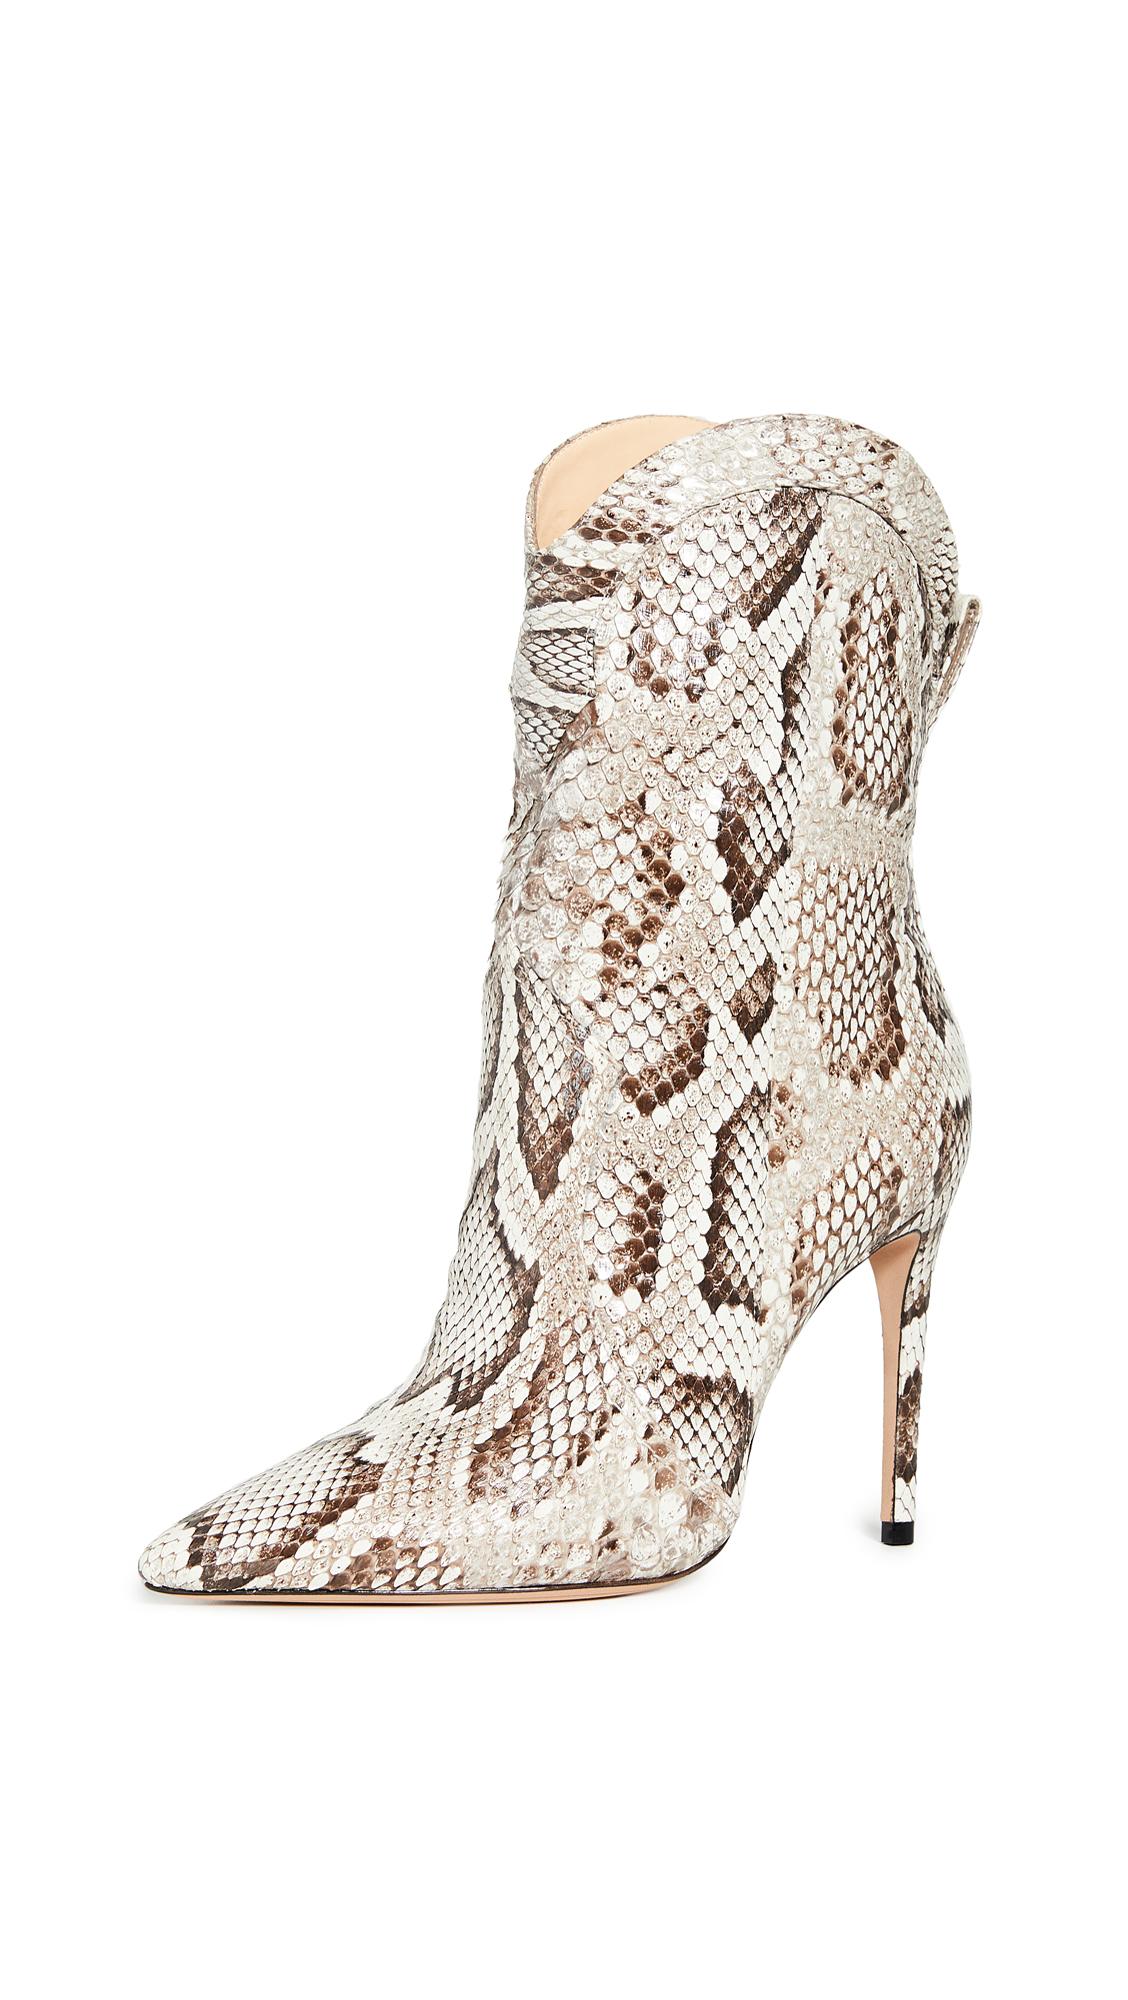 Buy Alexandre Birman Esther 100 Exotic Boots online, shop Alexandre Birman